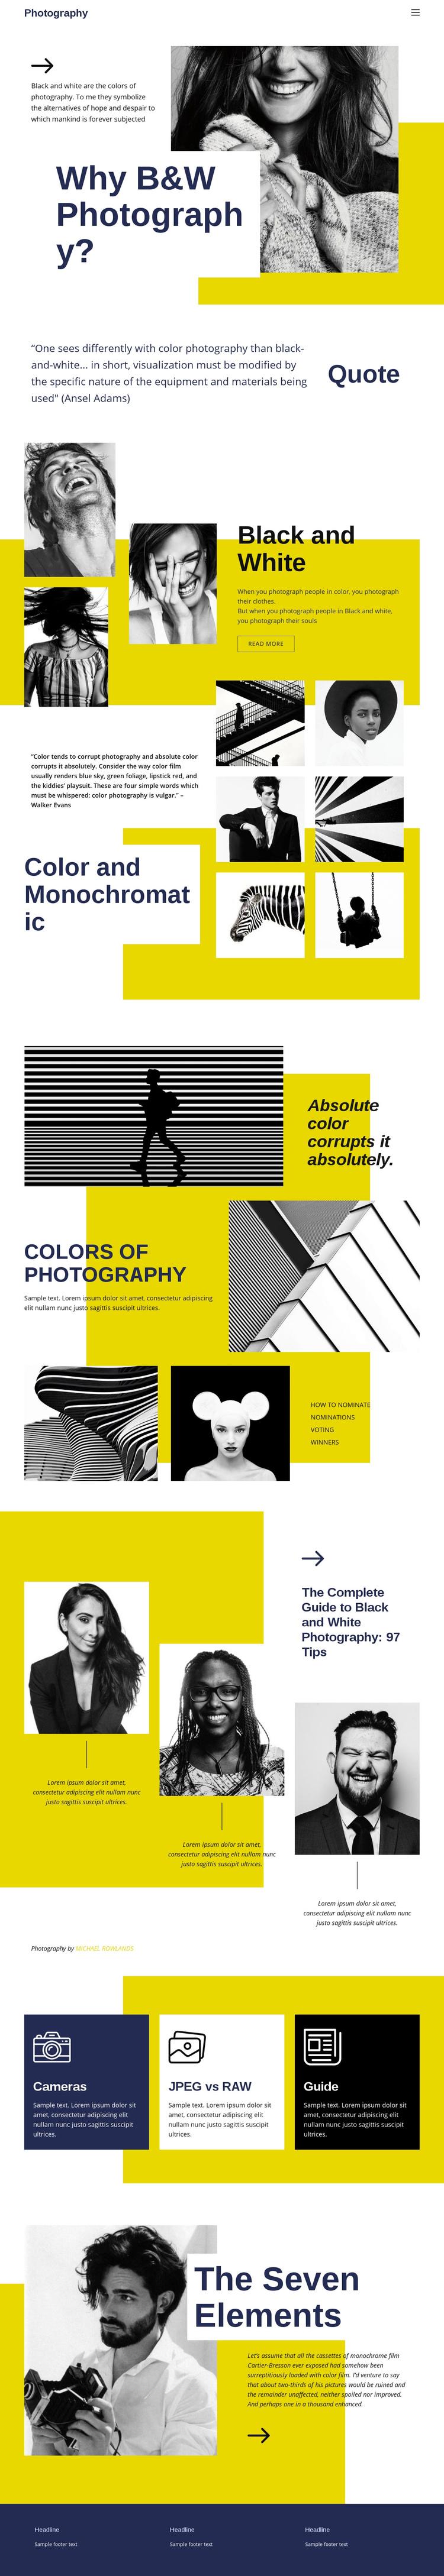 Photography Blog Website Builder Software